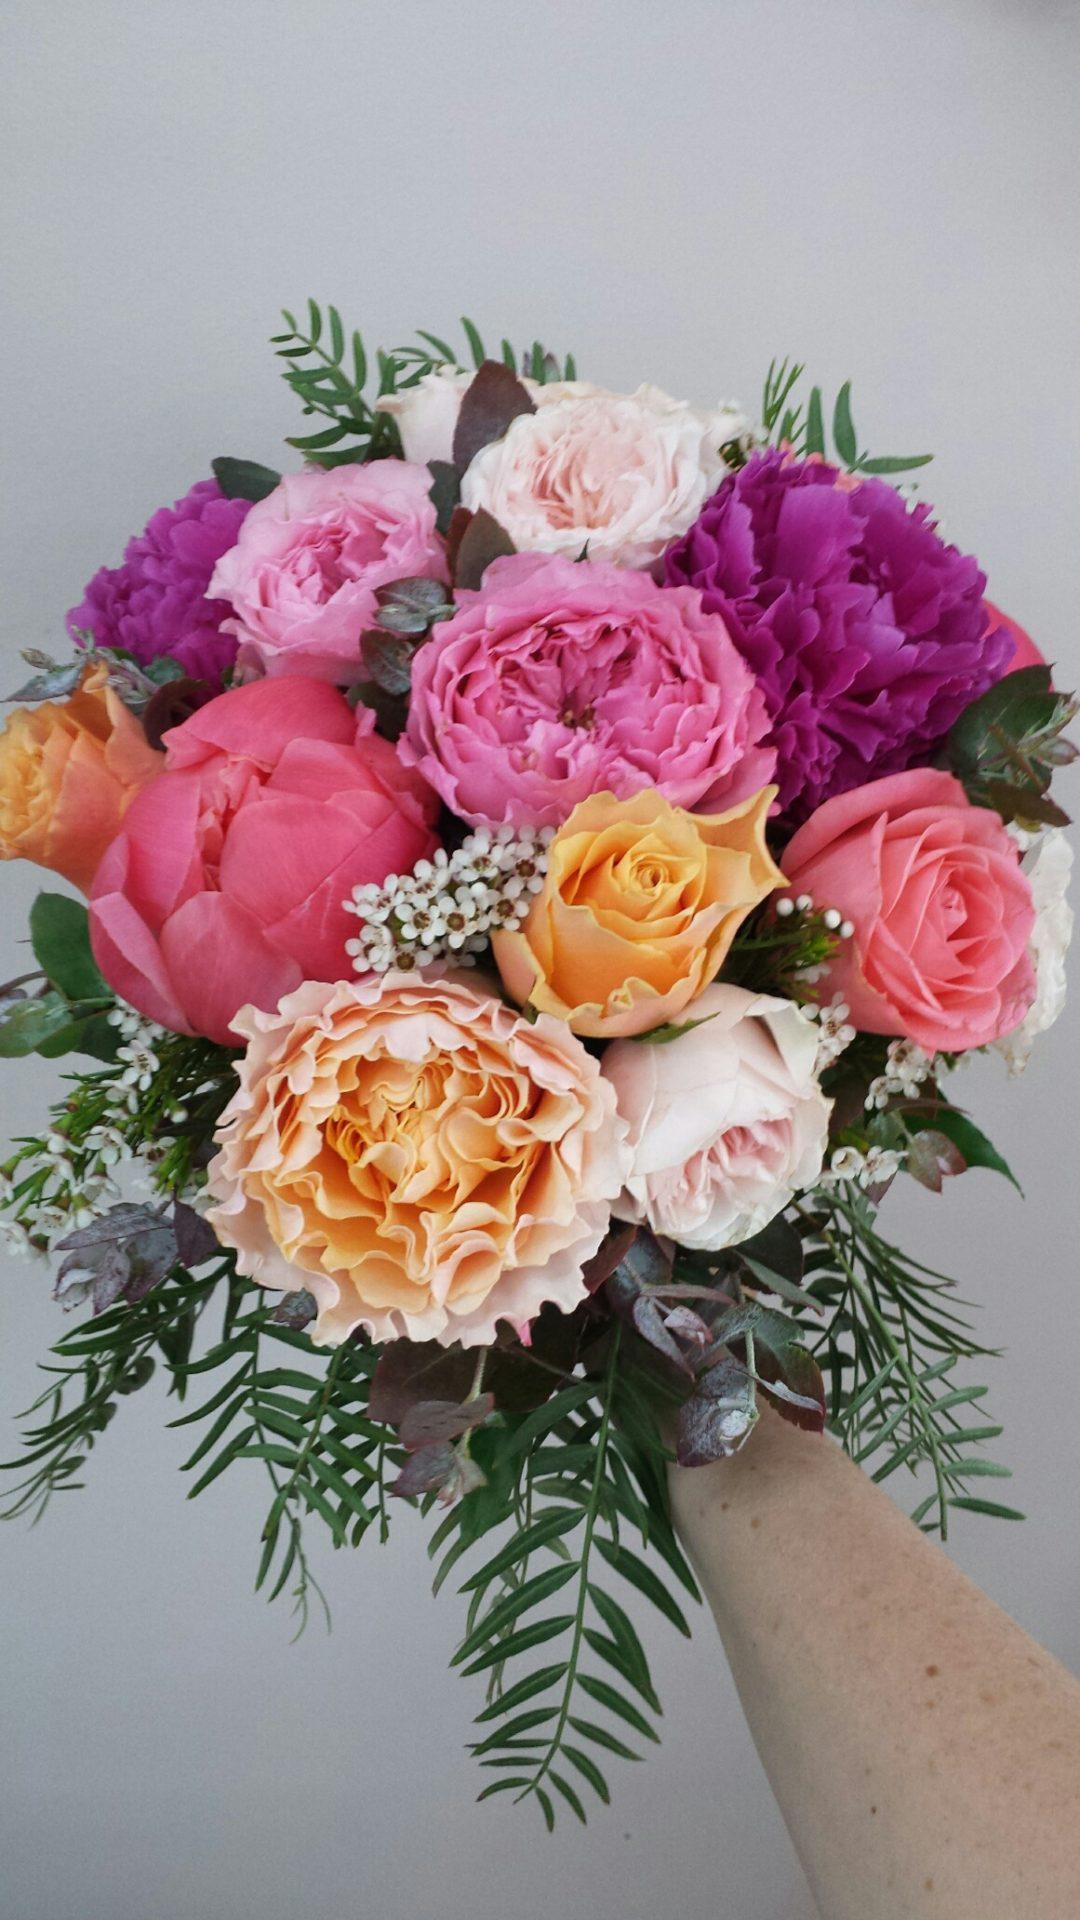 peonies-roses-peppercorn-and-bluegum-bouquet